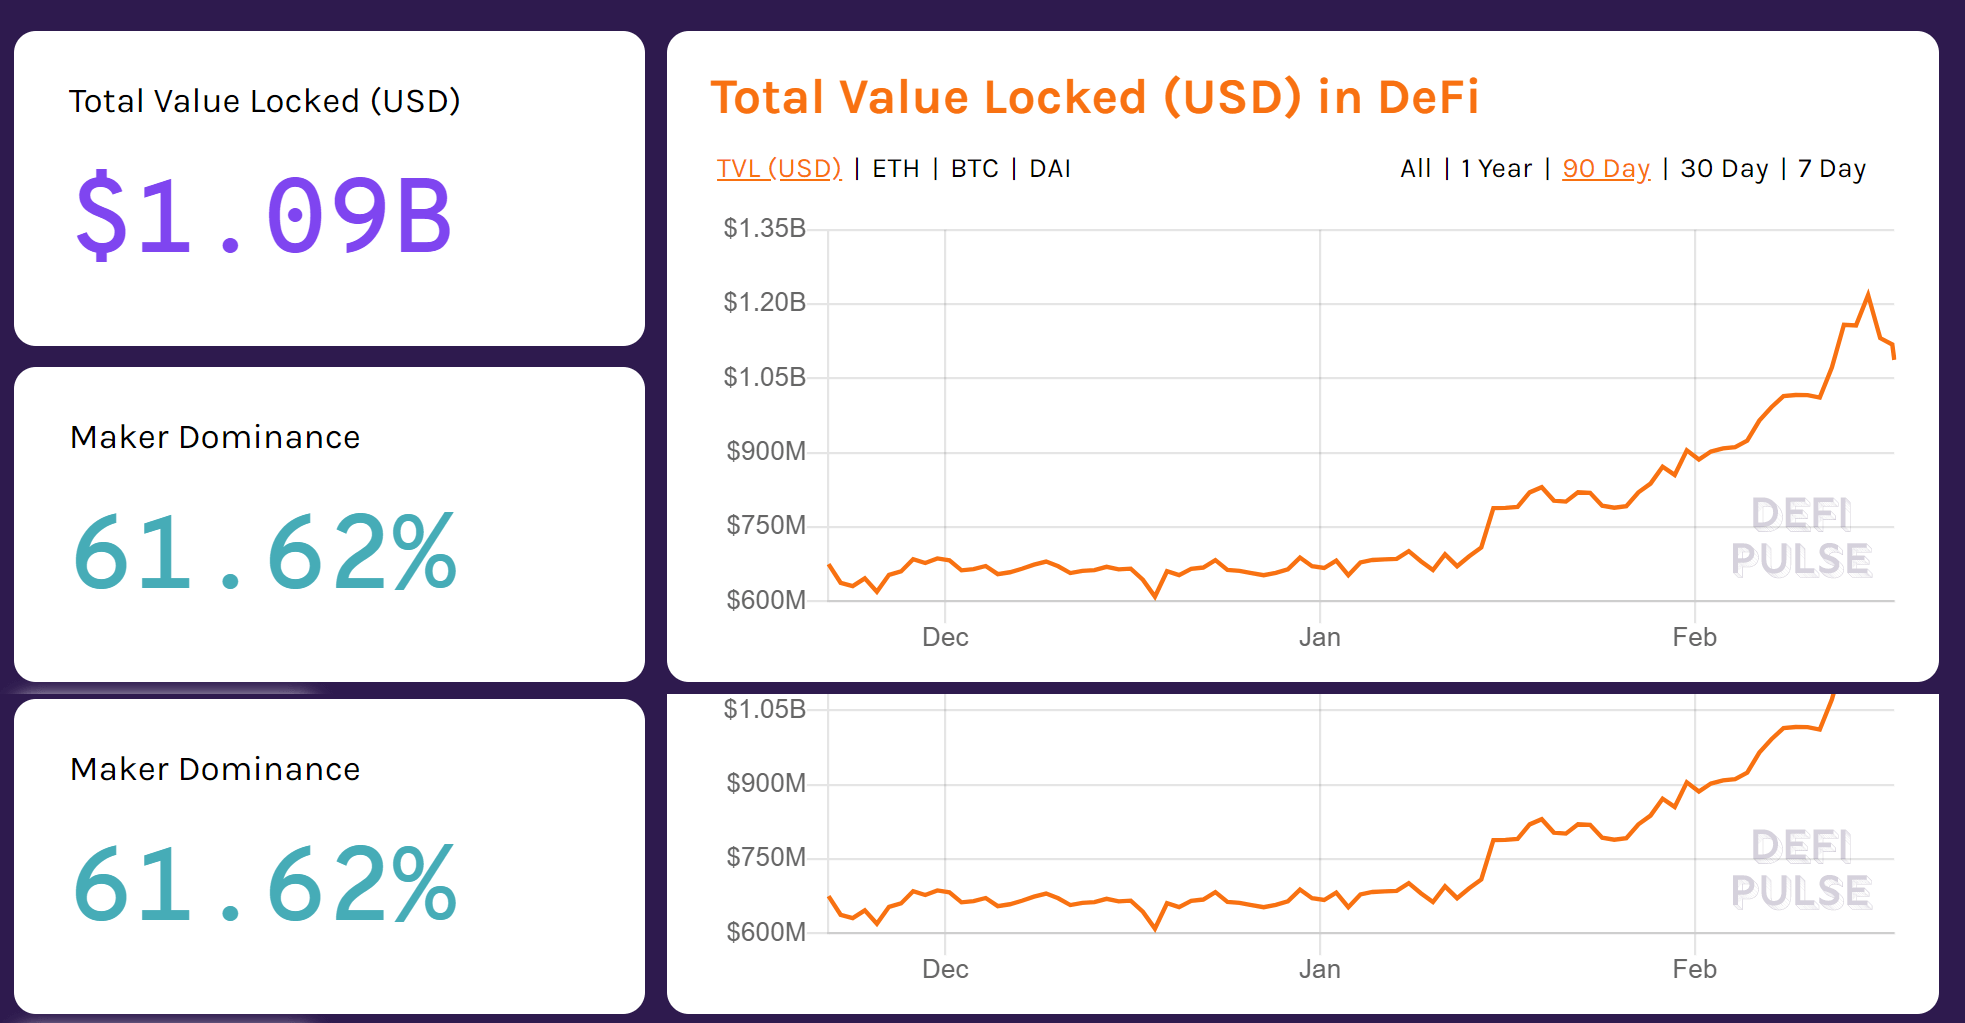 Ethereum DeFi market has seen parabolic growth